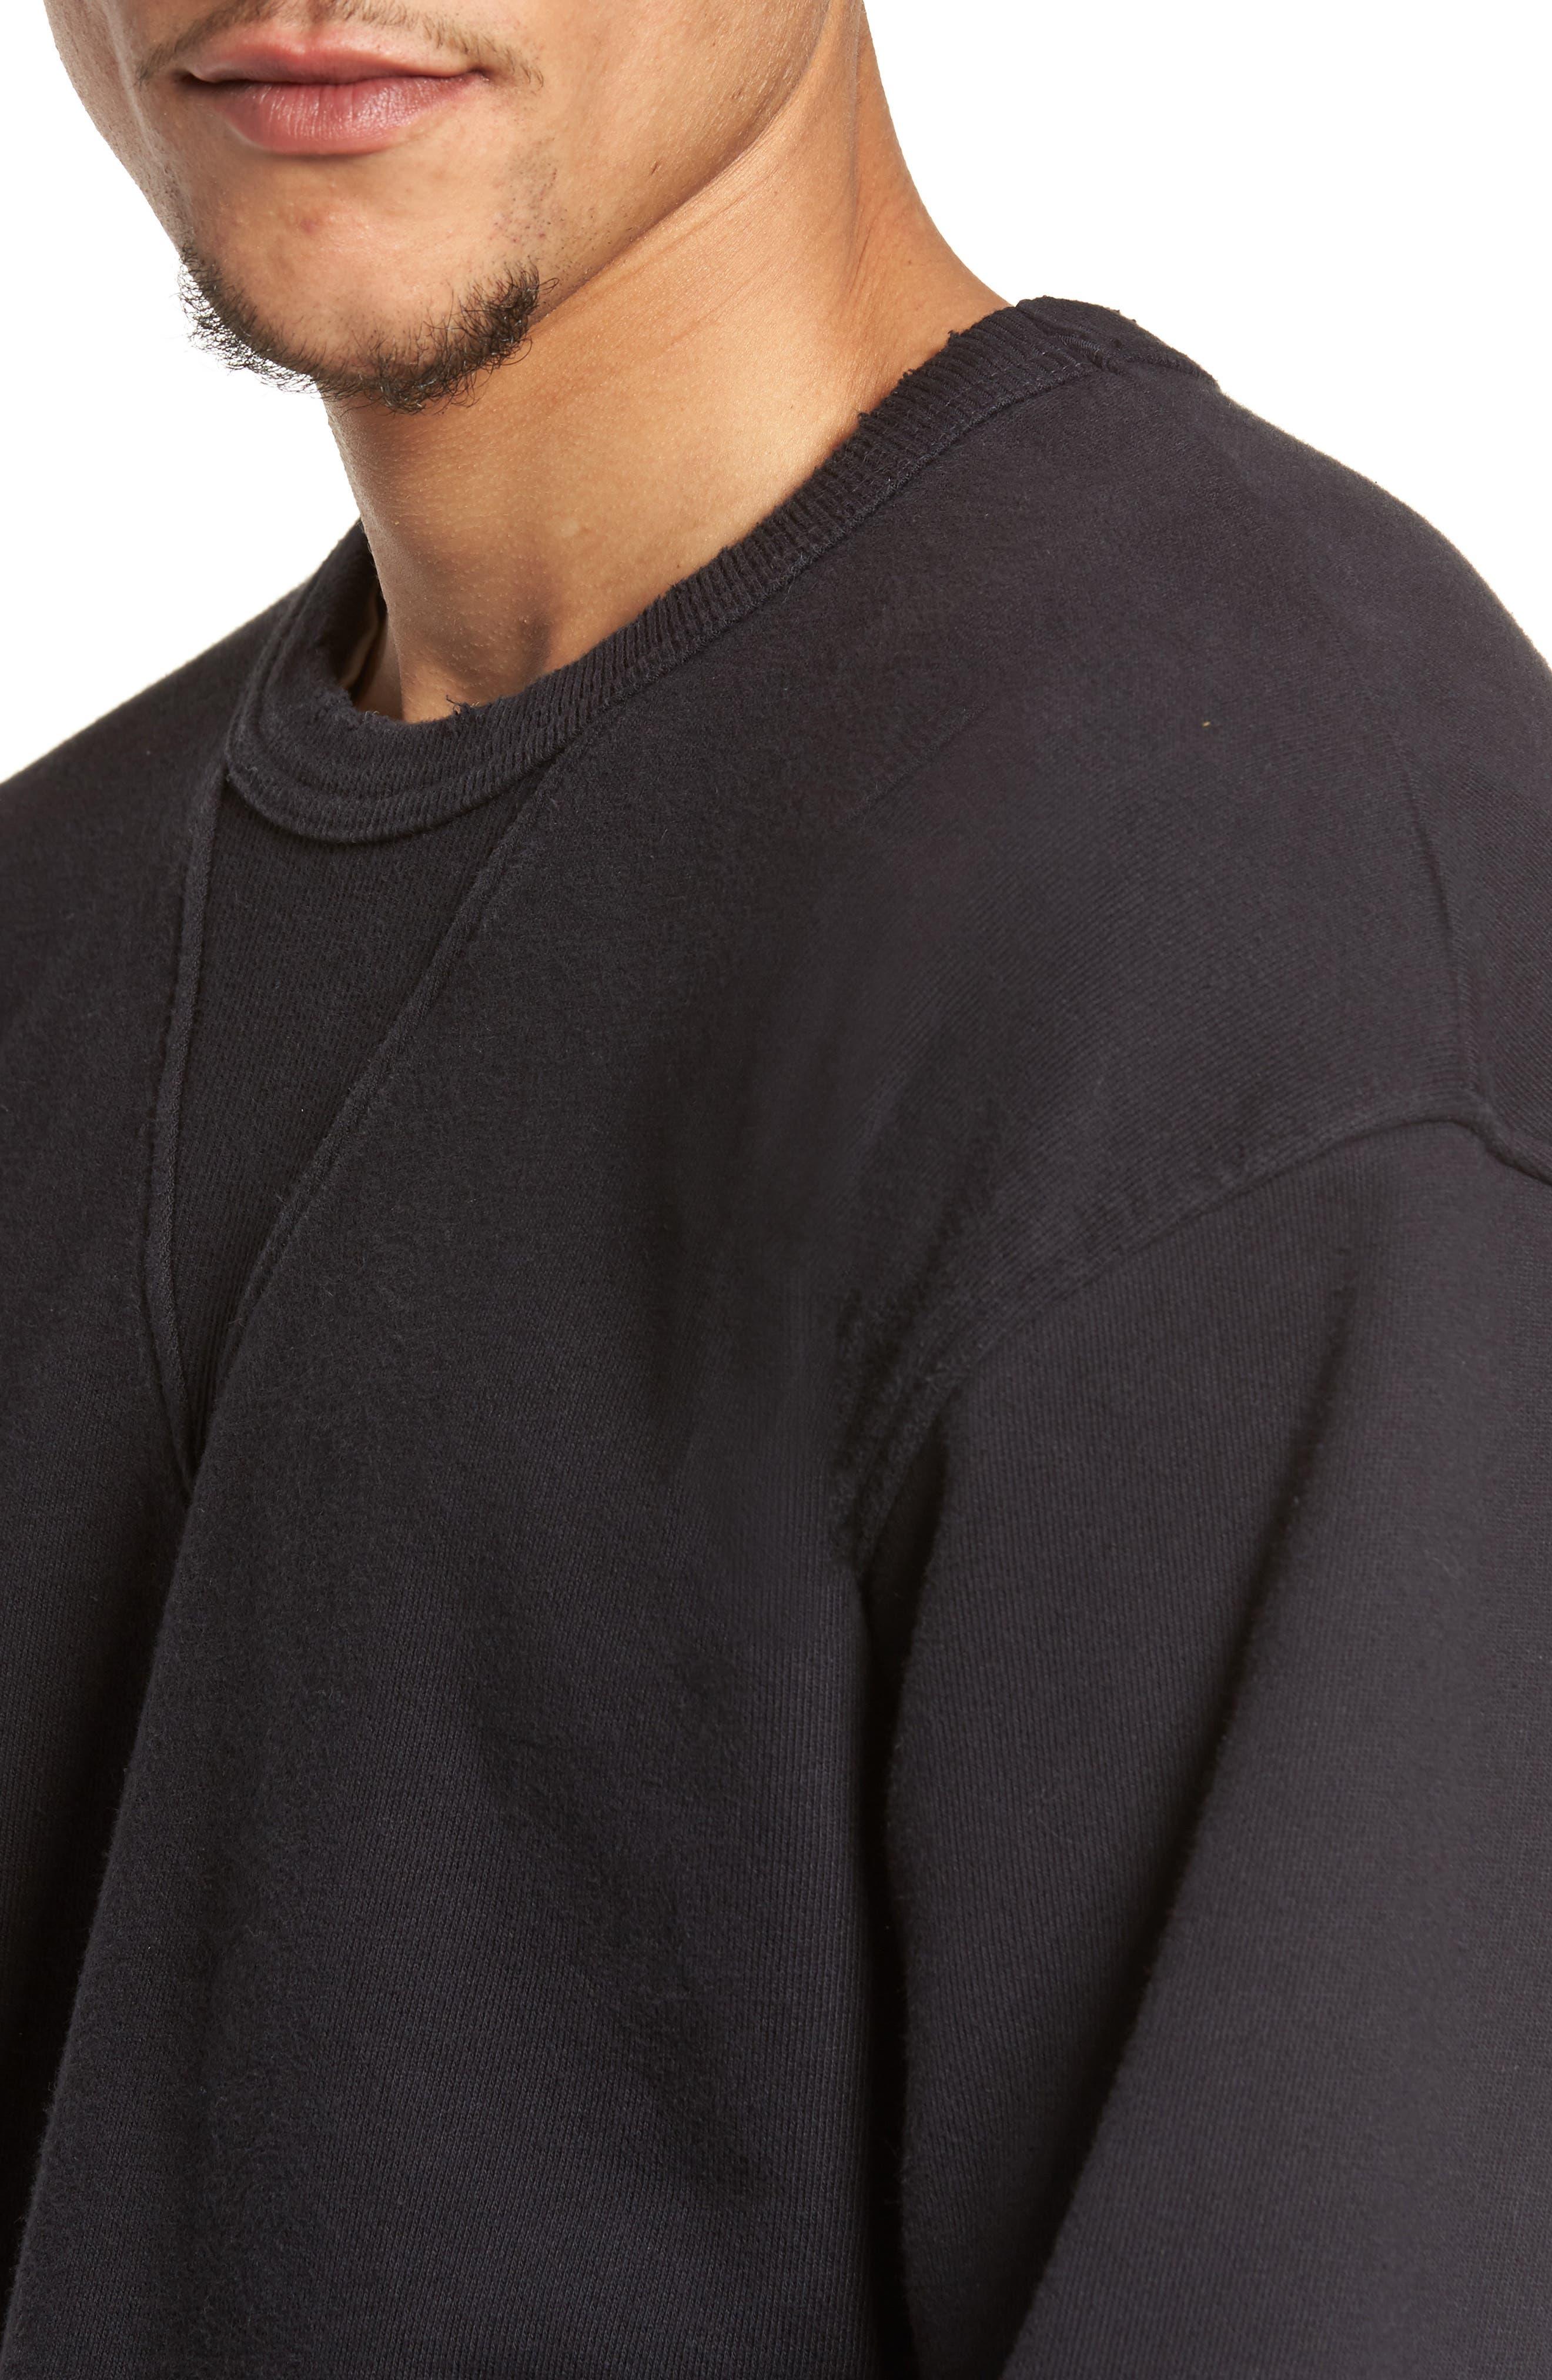 Distressed Sweatshirt,                             Alternate thumbnail 4, color,                             001